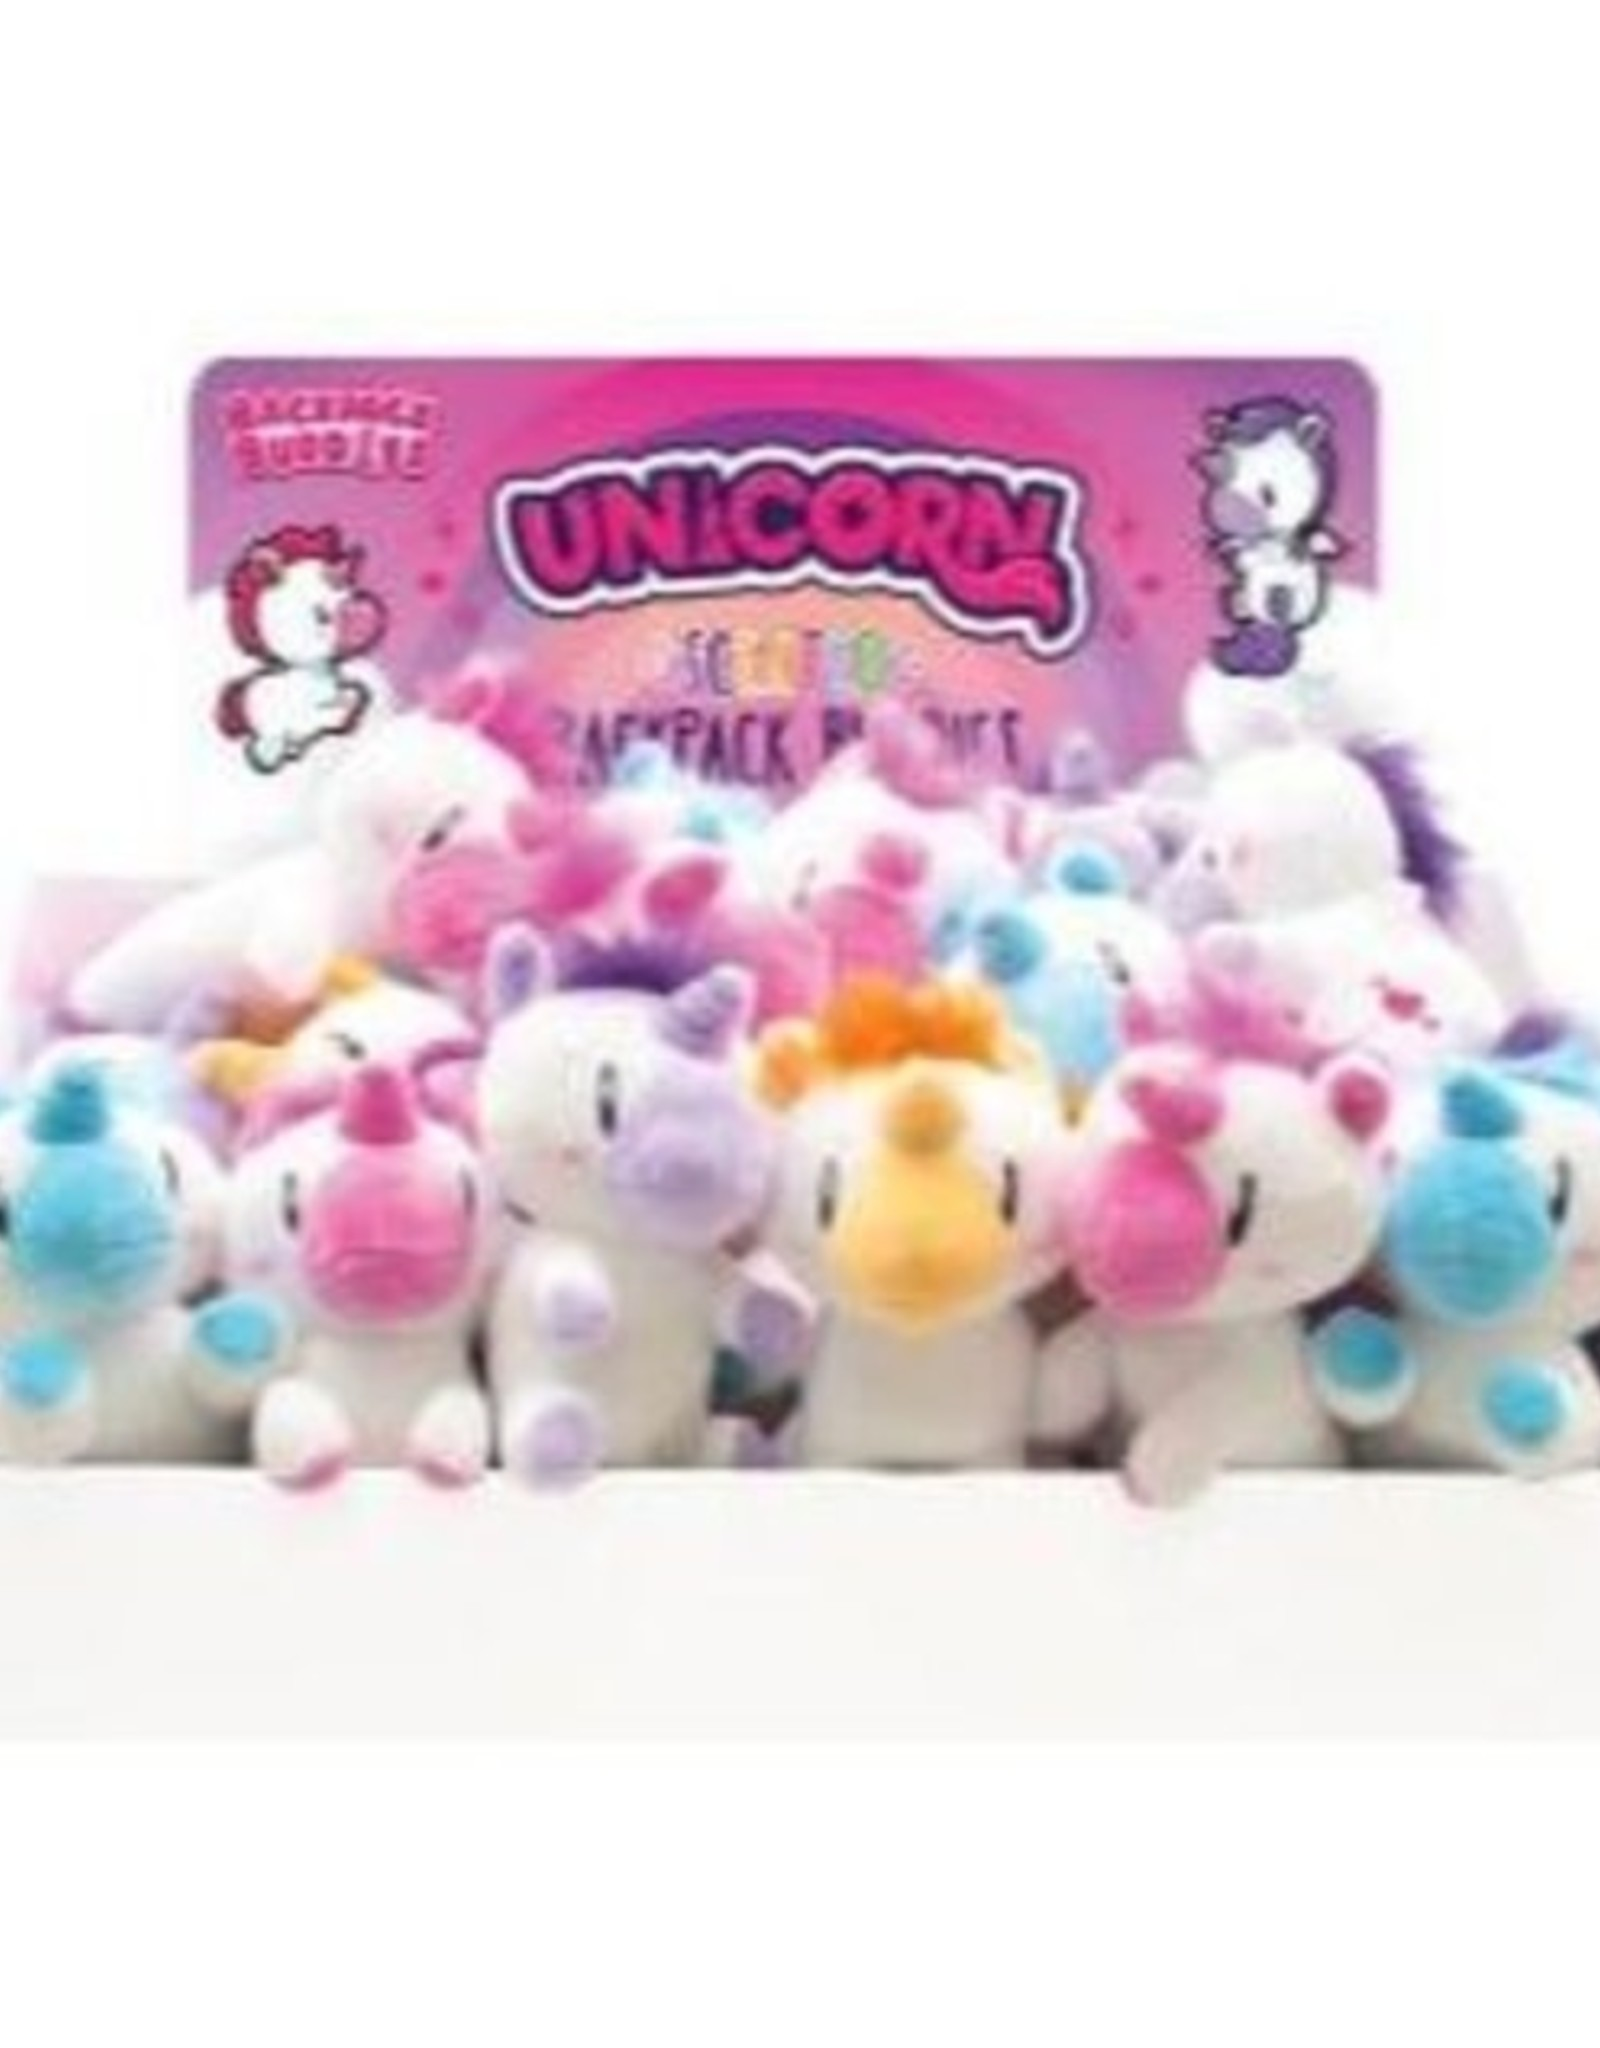 Scentco Backpack Buddies Unicorn - Scented